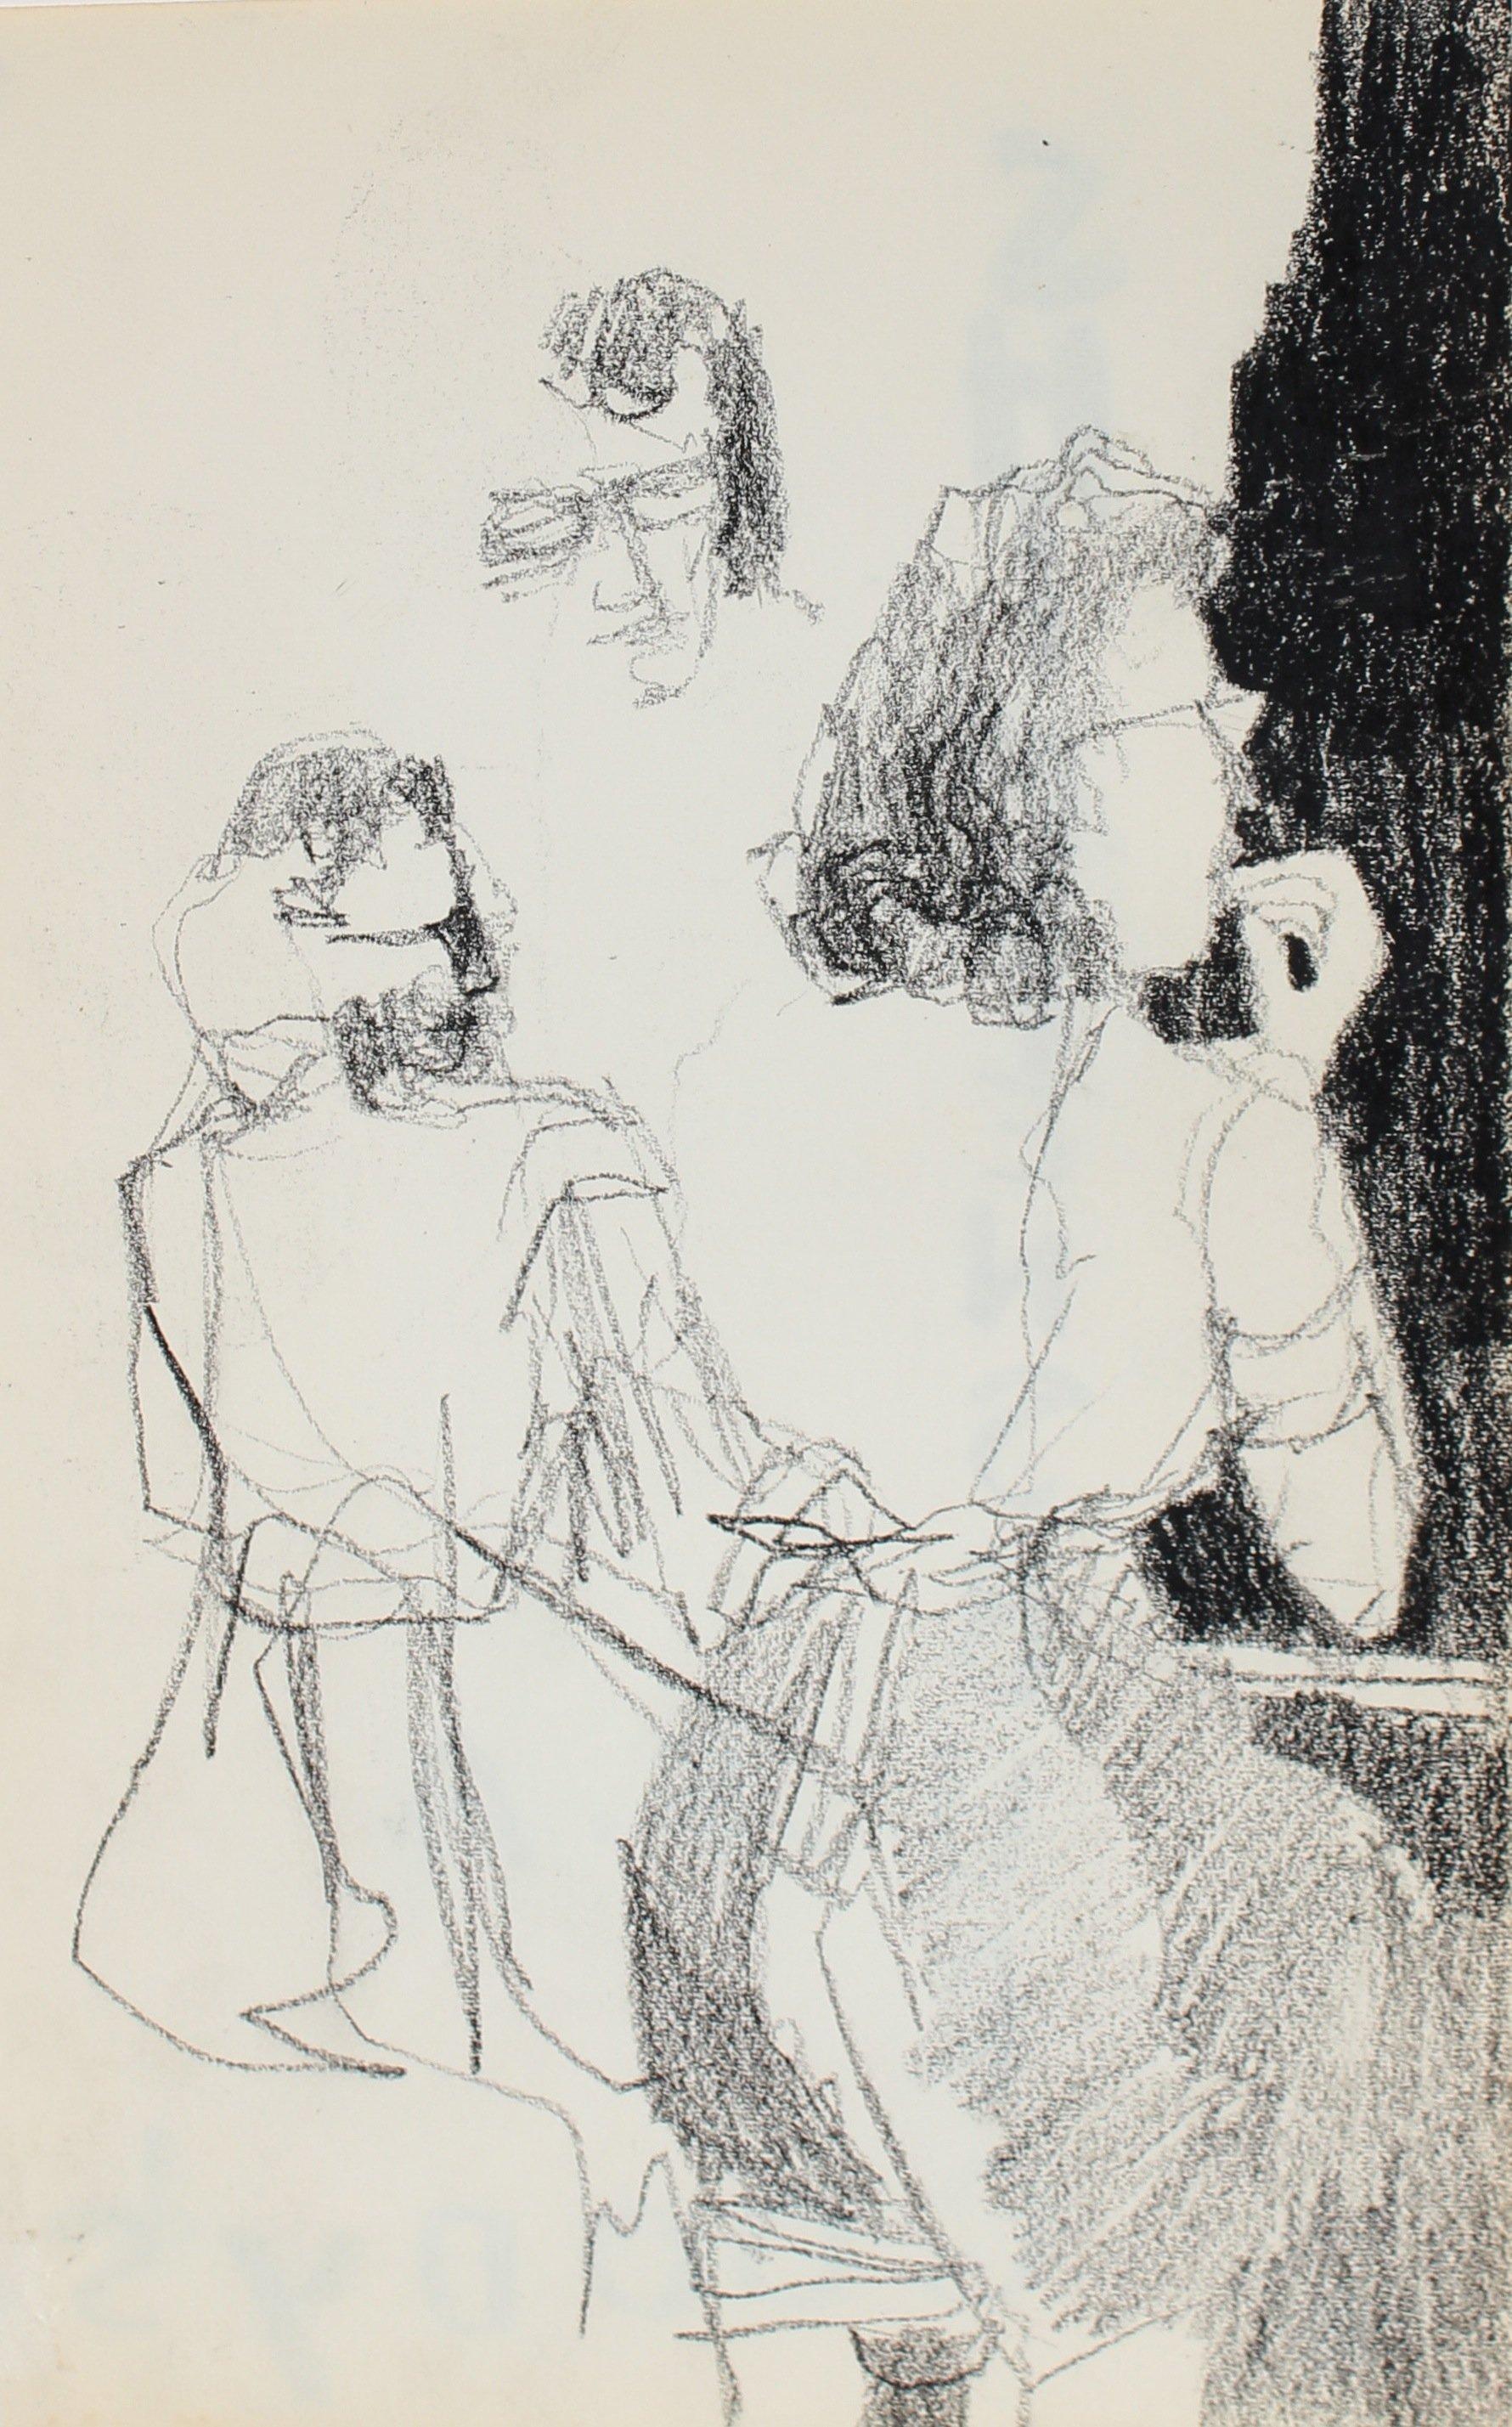 Petite Female Figurative Study Charcoal 1950-60s